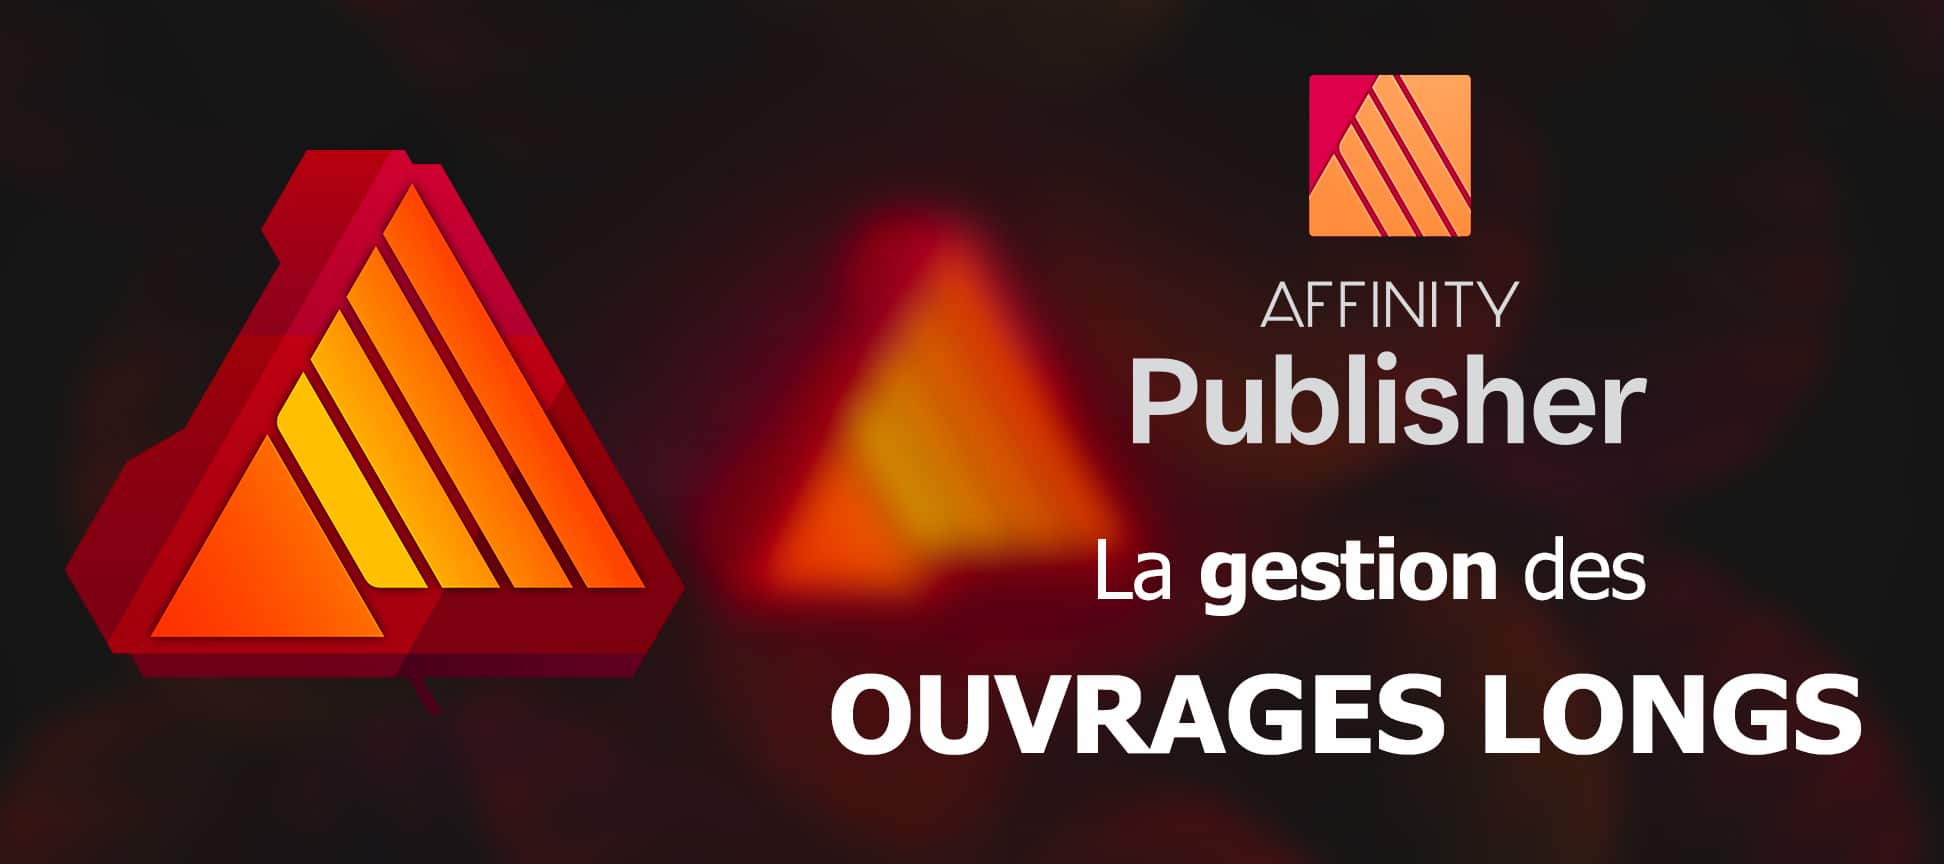 Gestion des ouvrages long dans Affinity Publisher